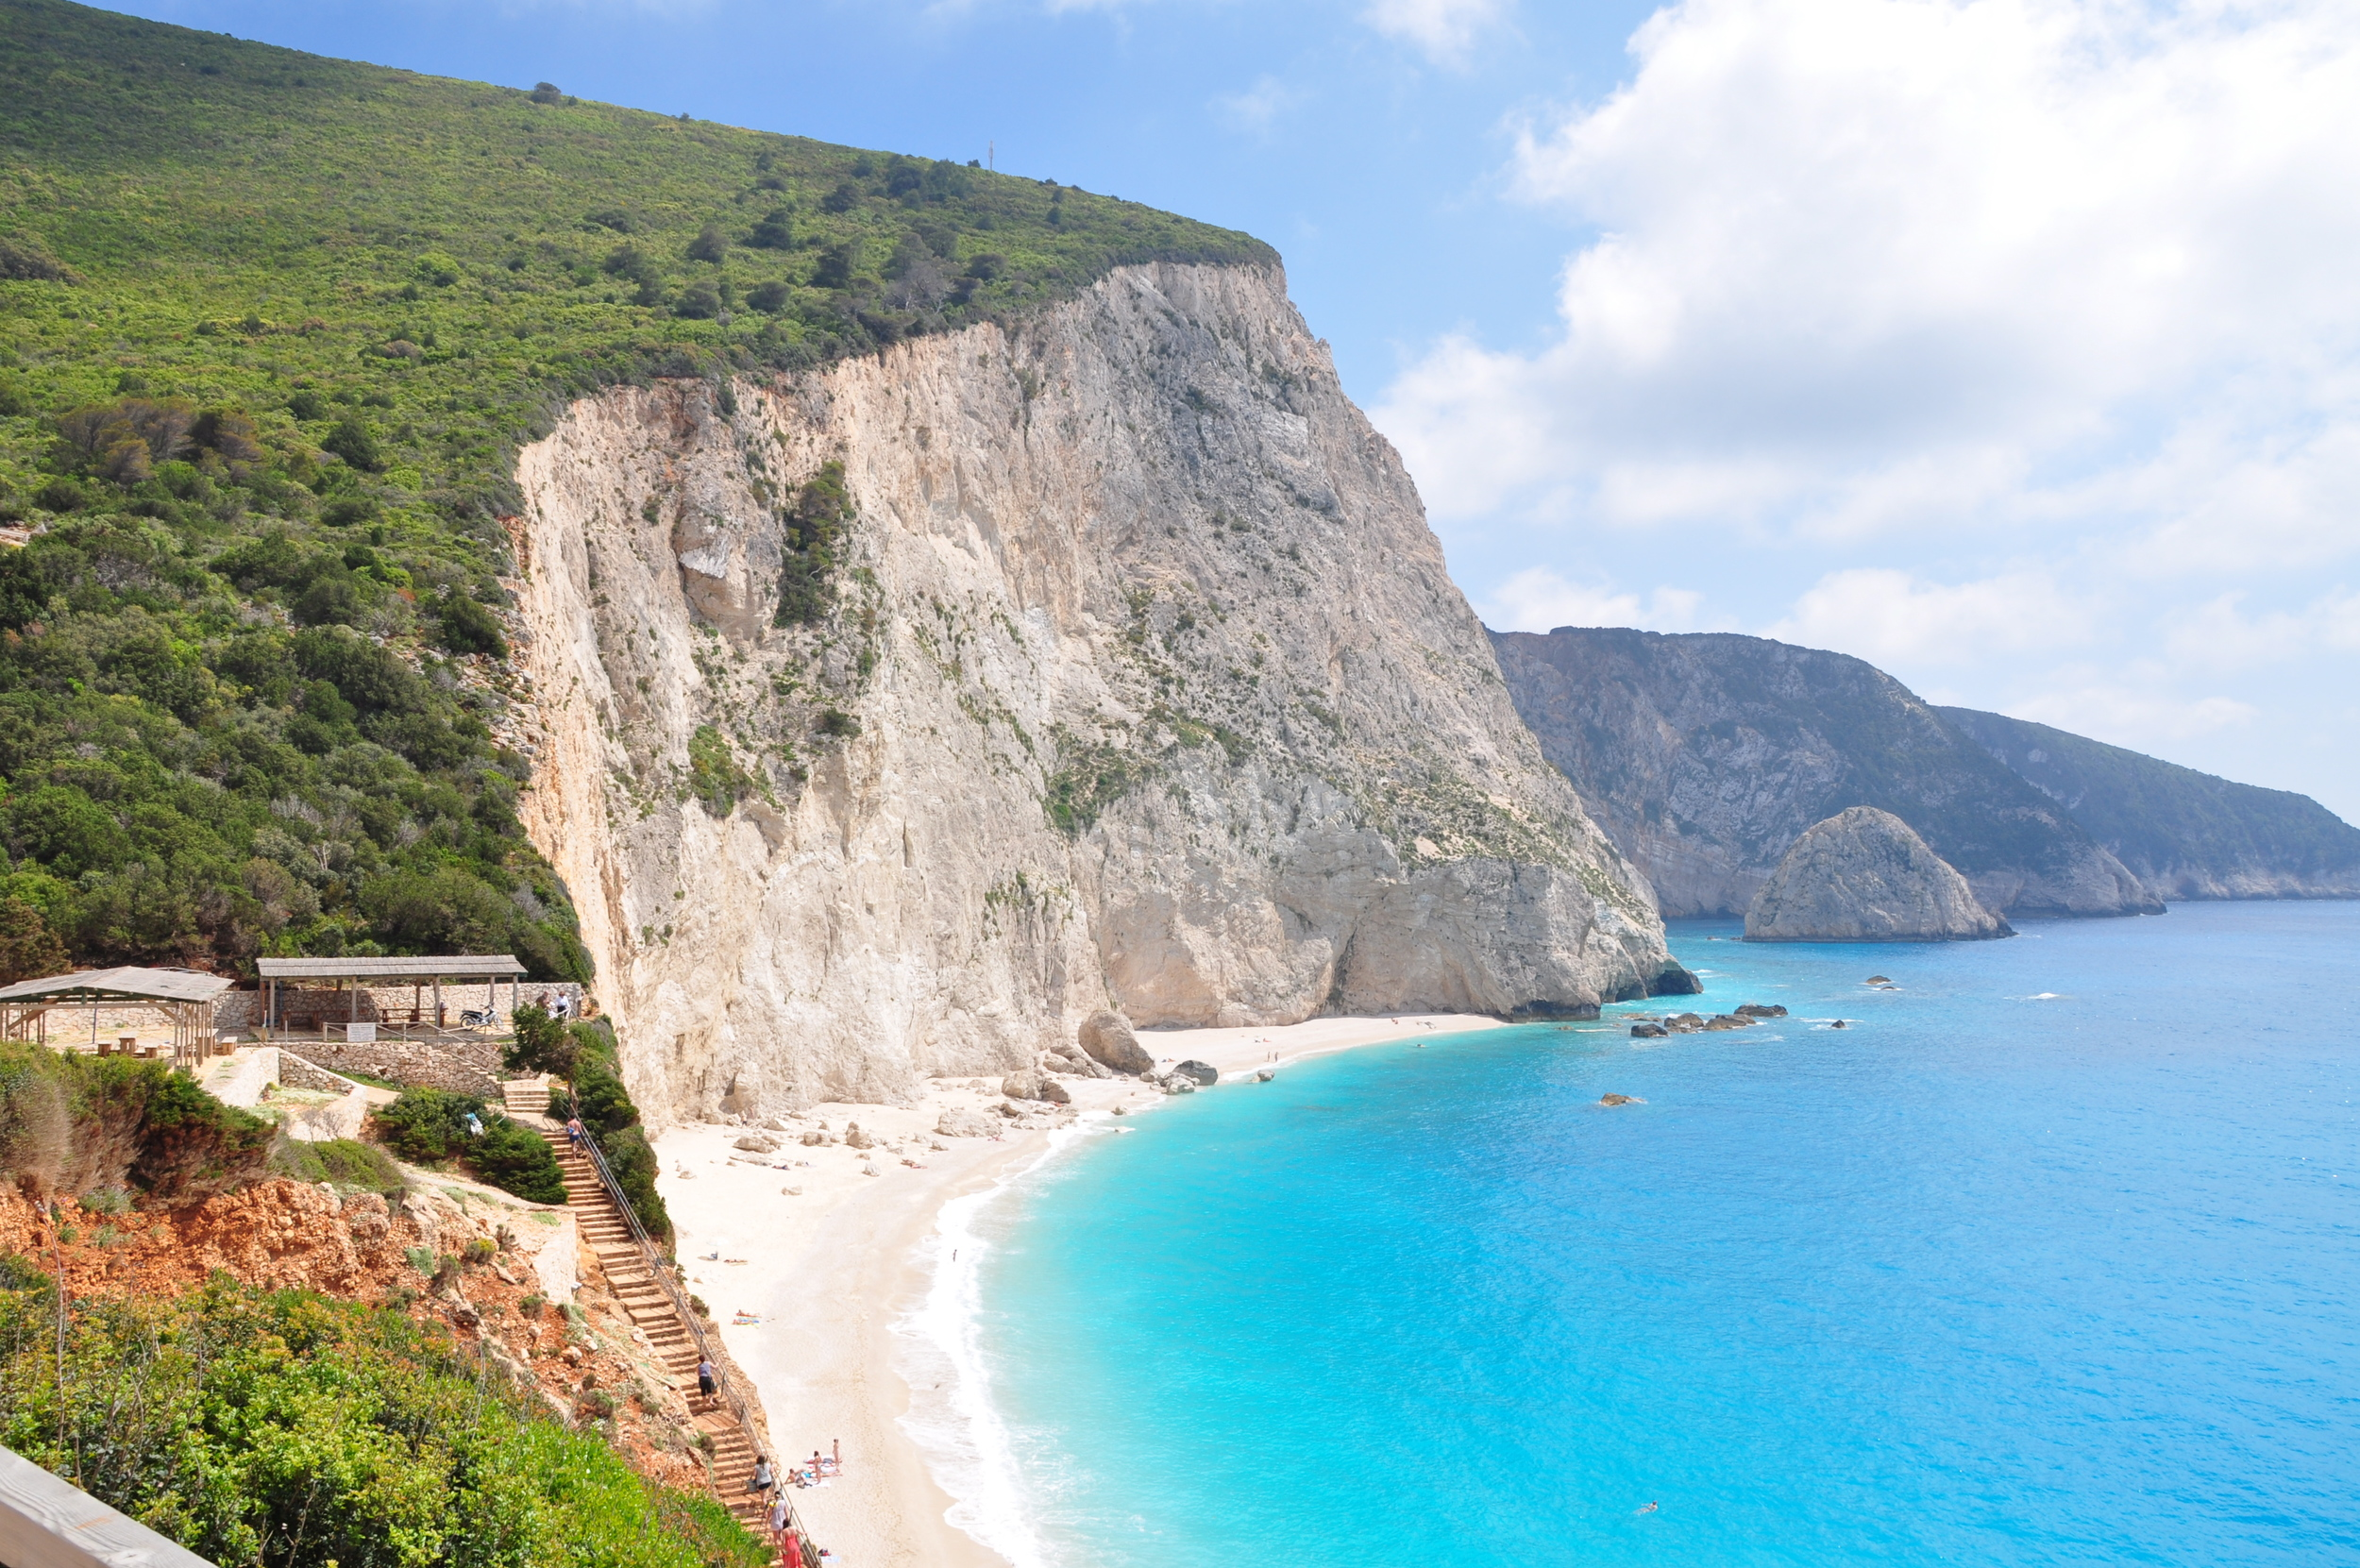 porto-katsiki-isola-lefkada-grecia.jpg